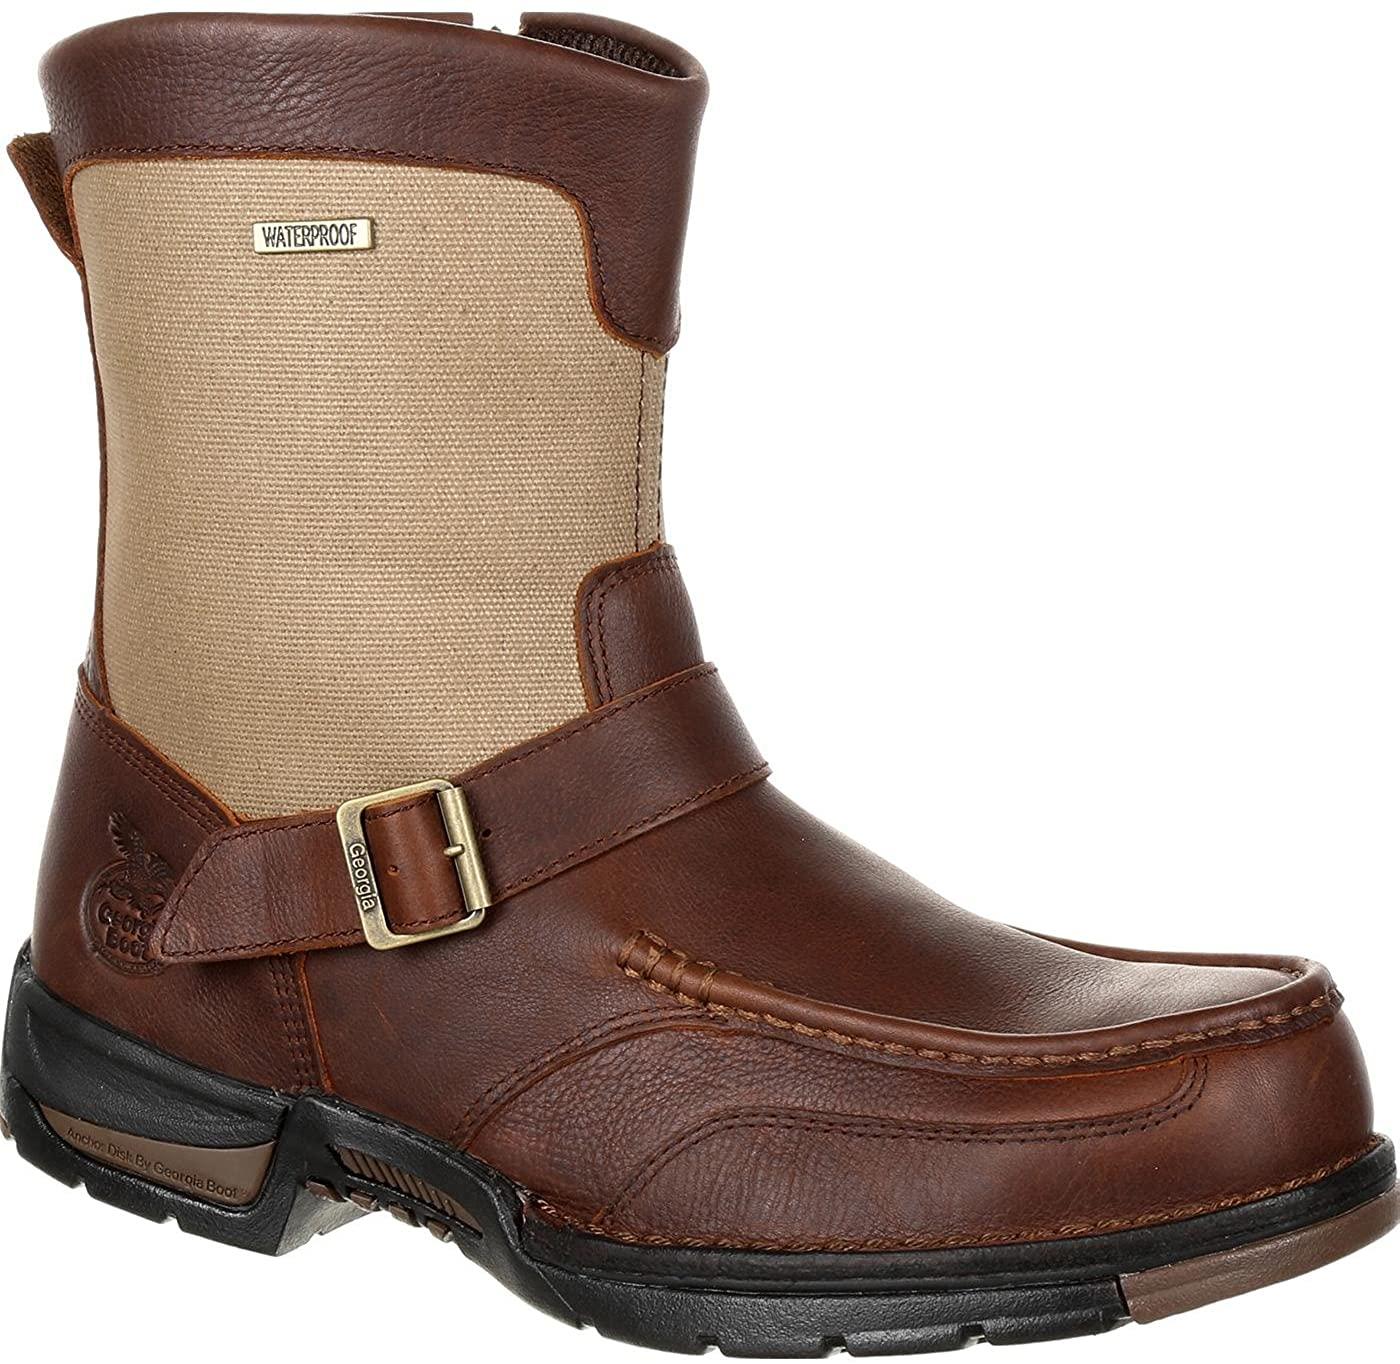 Georgia Boot Athens Waterproof Side-Zip Boot